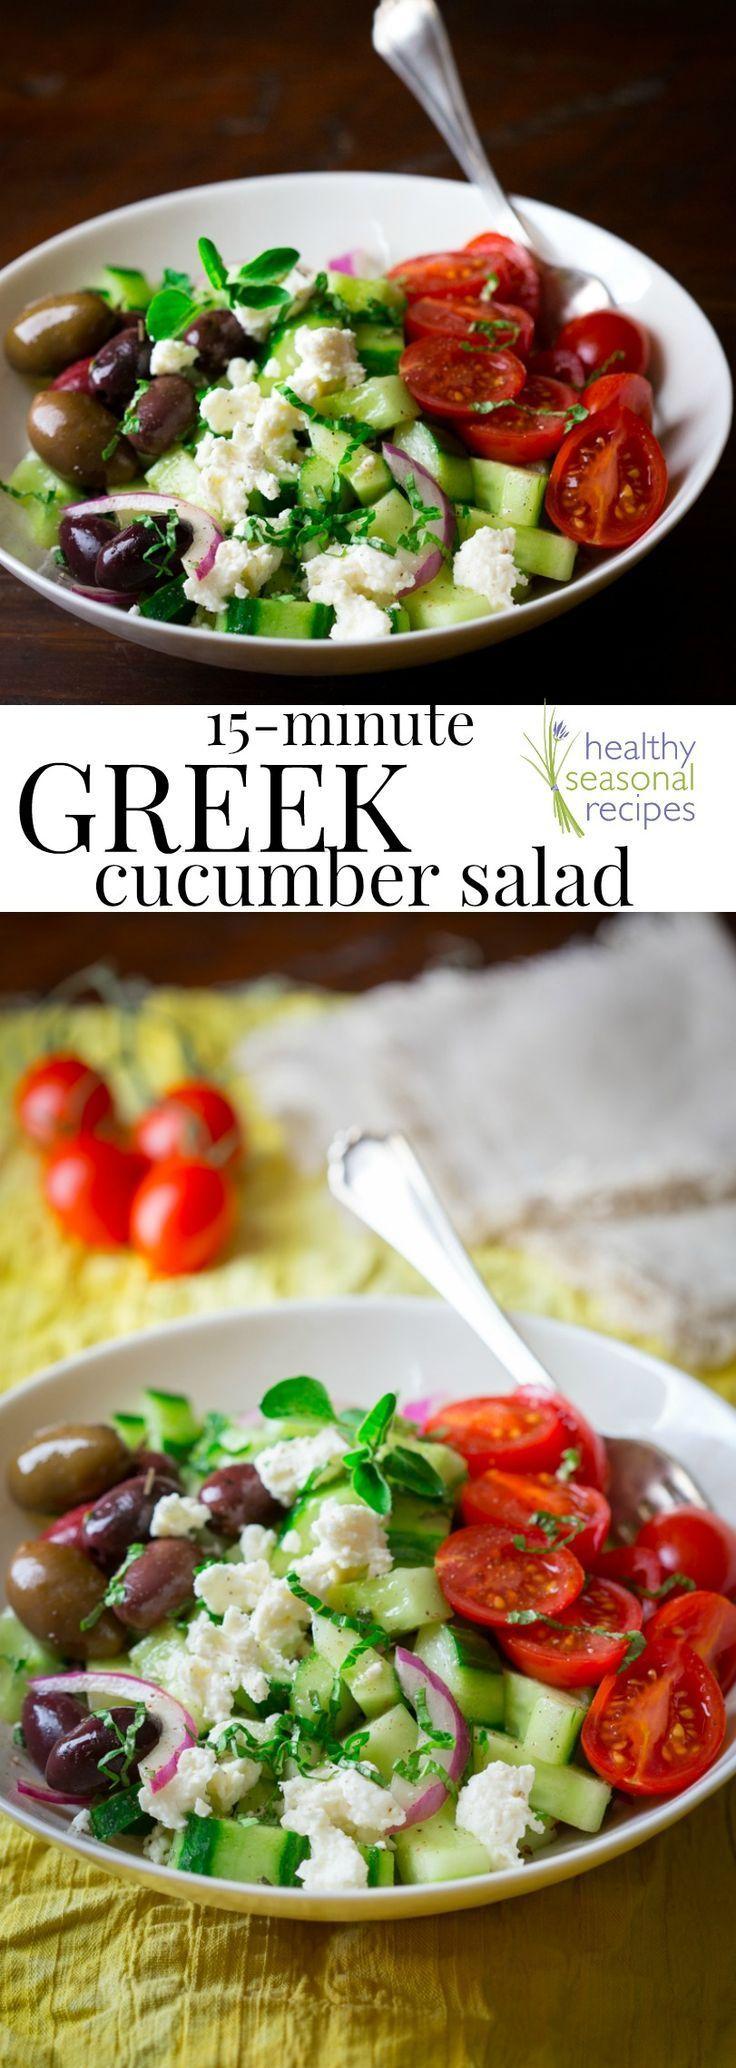 15 minute greek cucumber salad - Healthy Seasonal Recipes